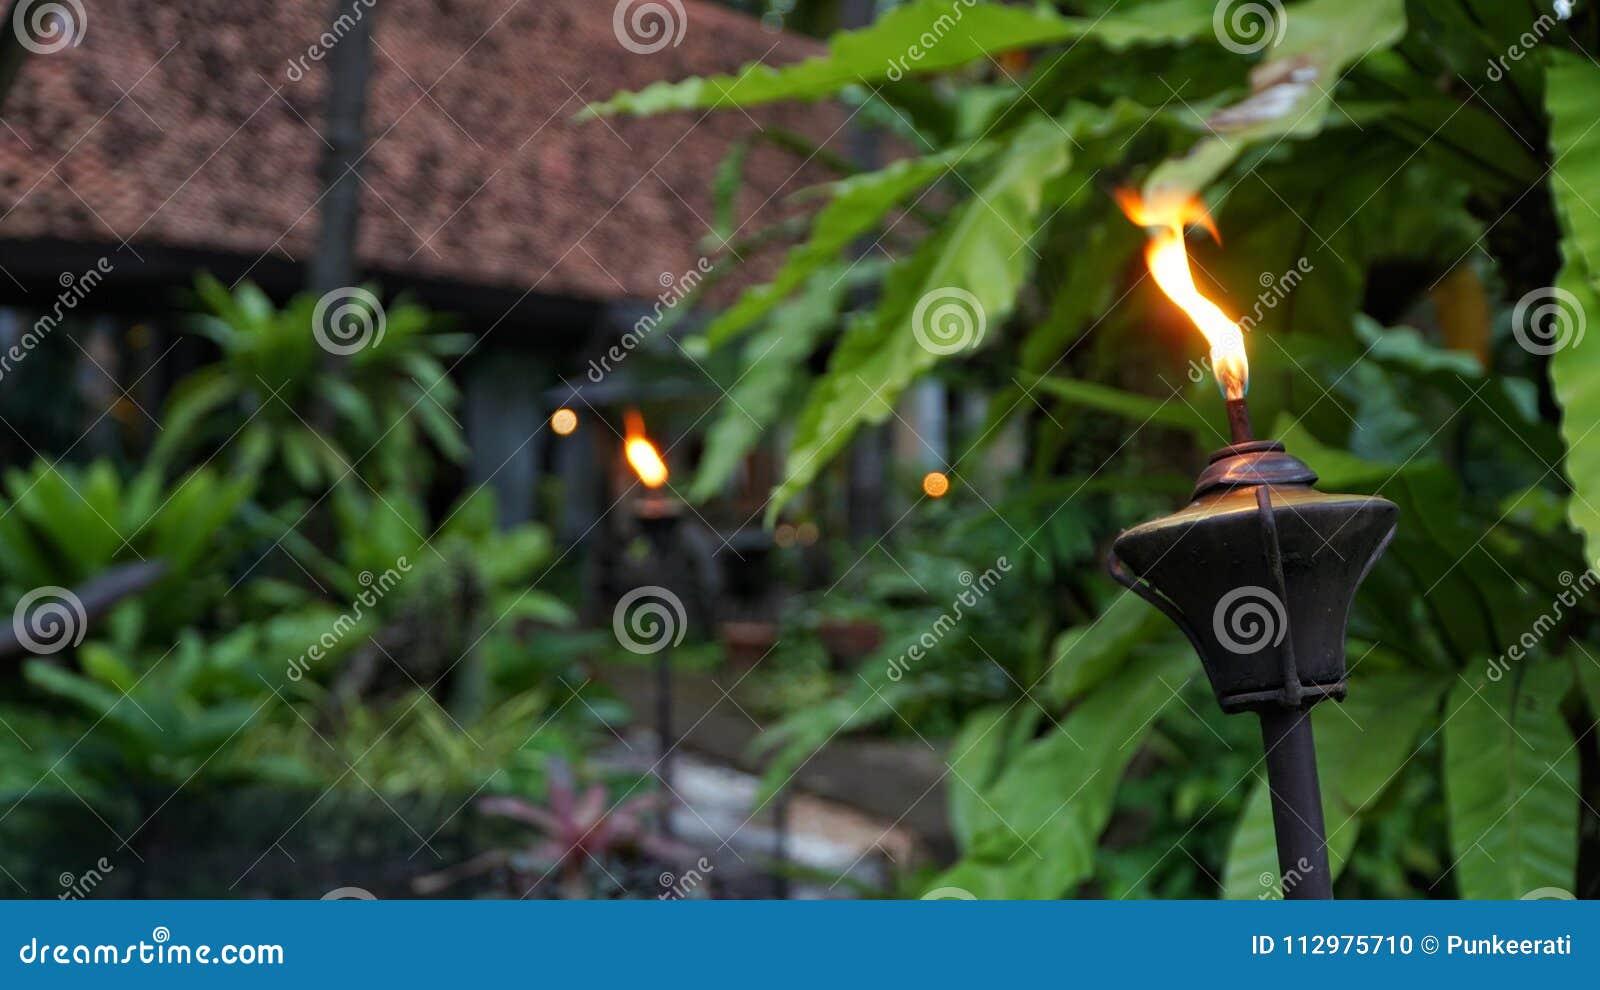 Closeup shot of Lamppost,Lantern with garden background